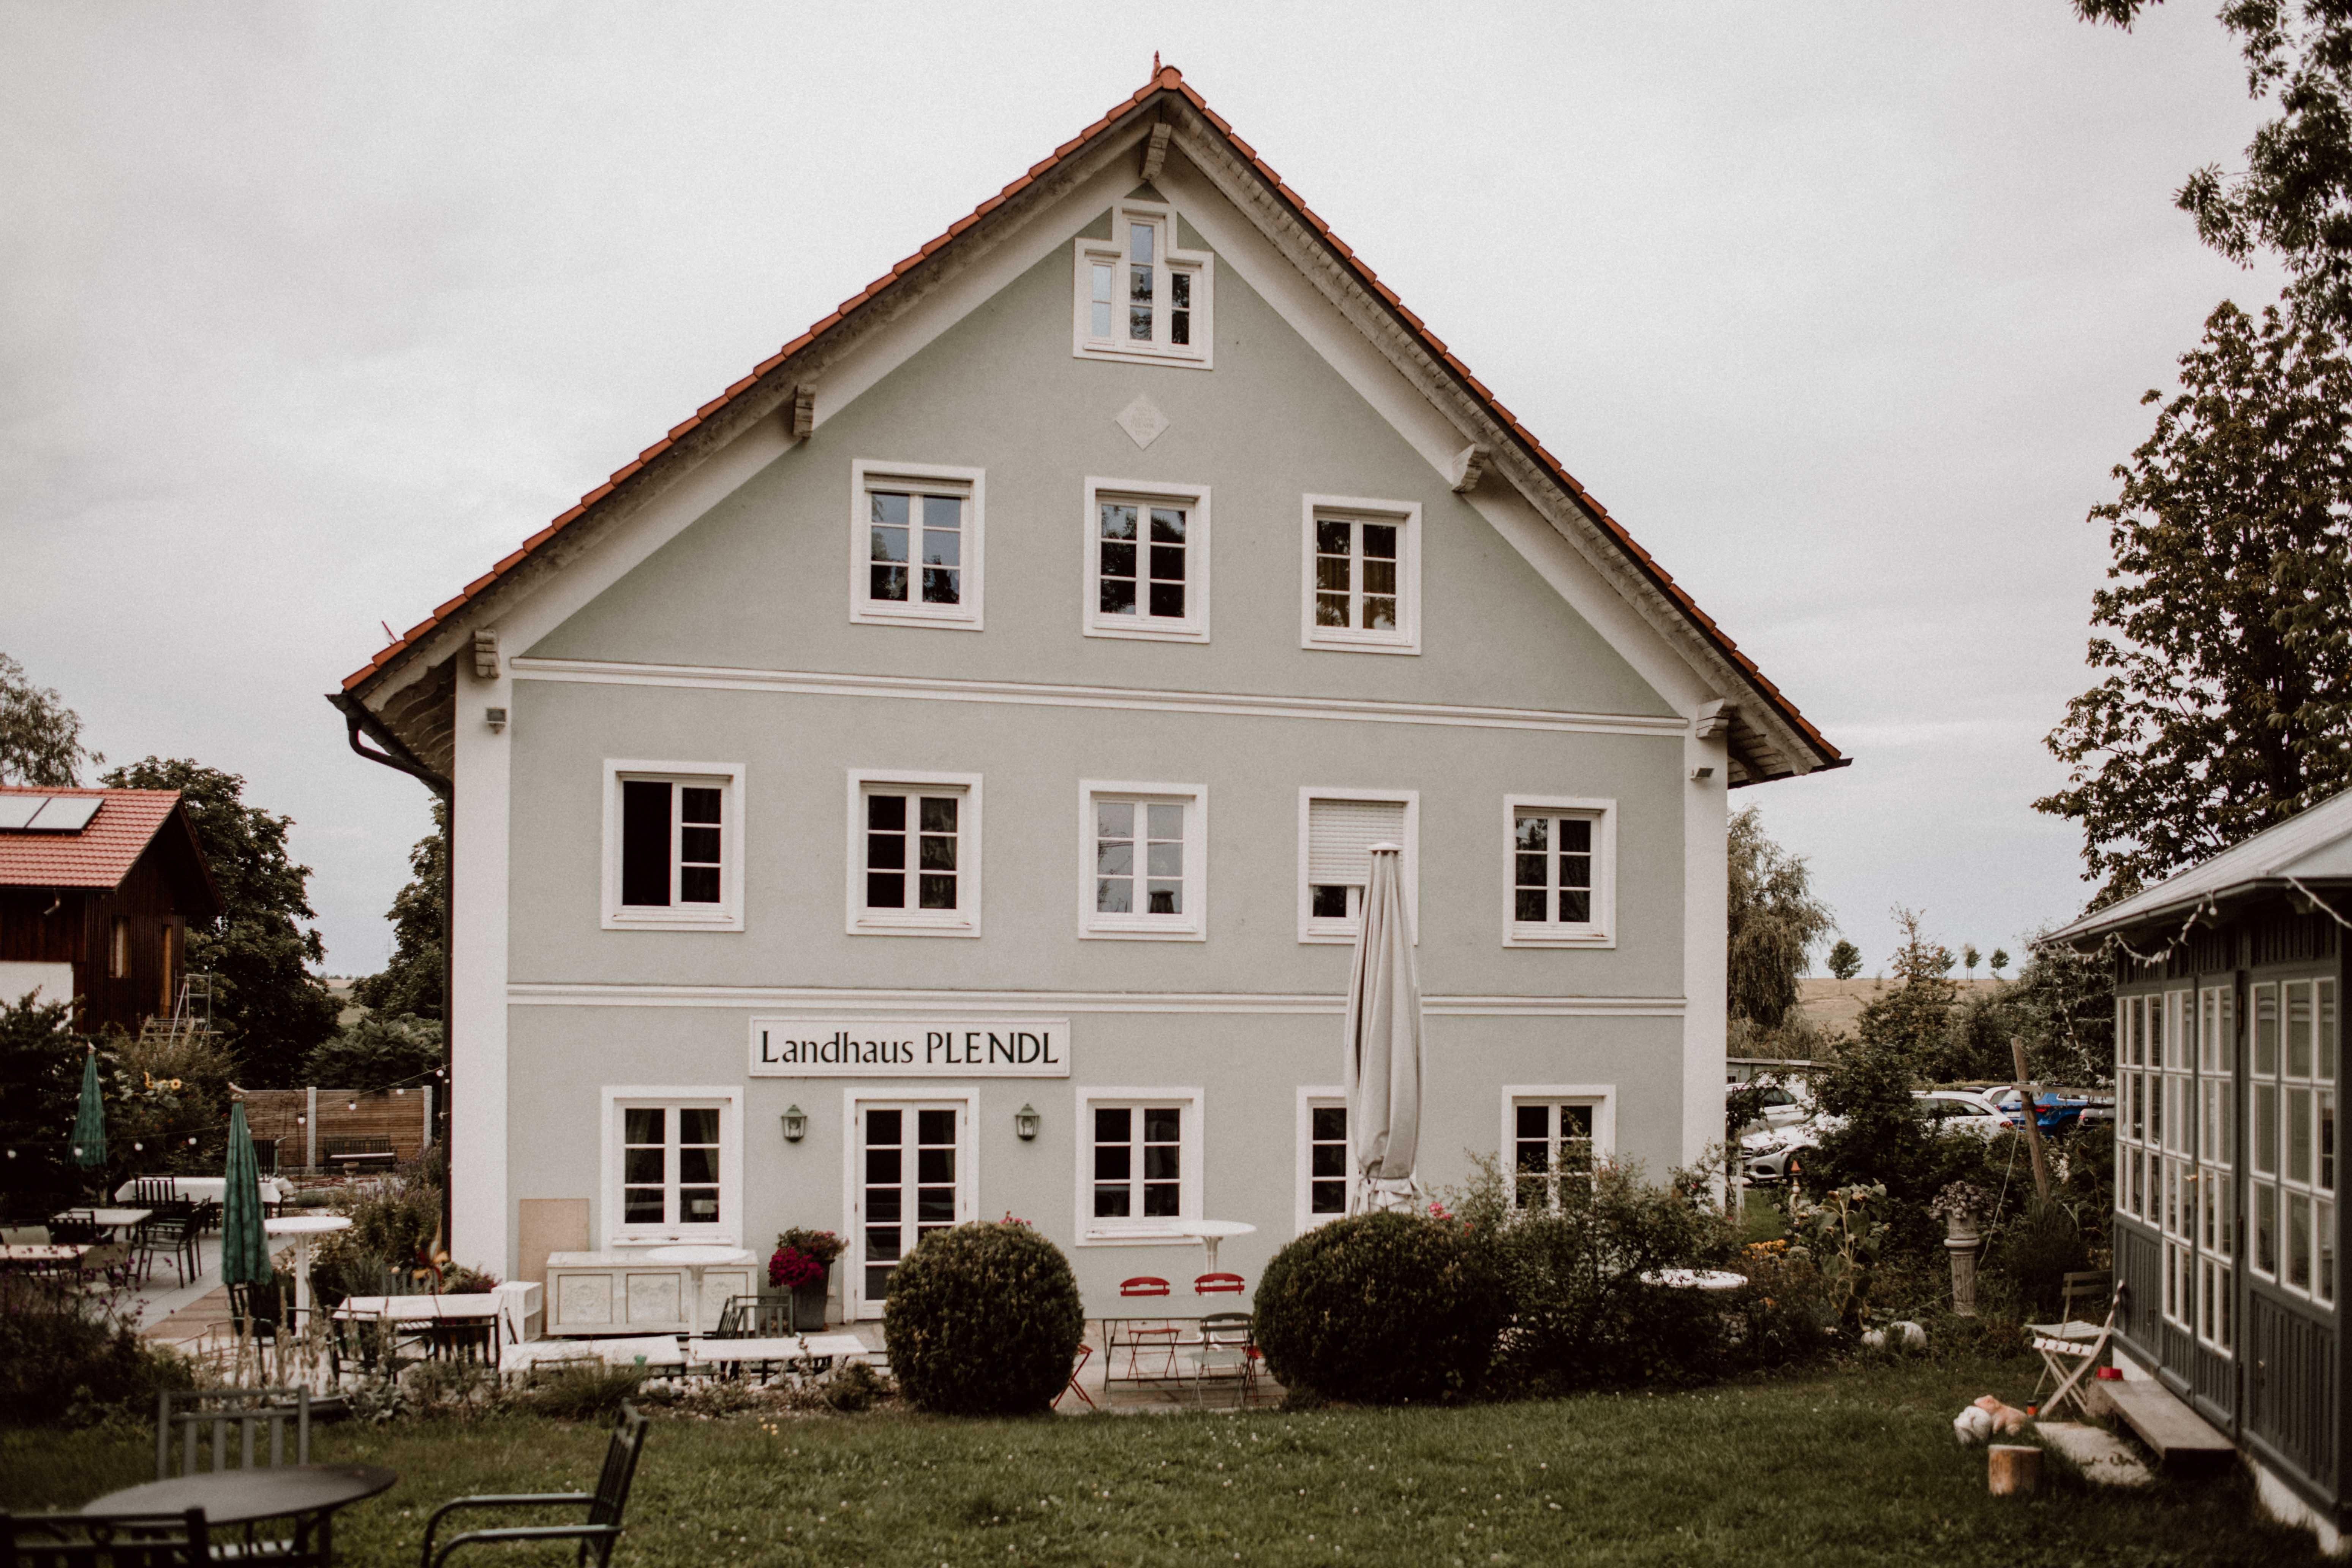 location landhaus sonja poehlmann photography couples muenchen bayern